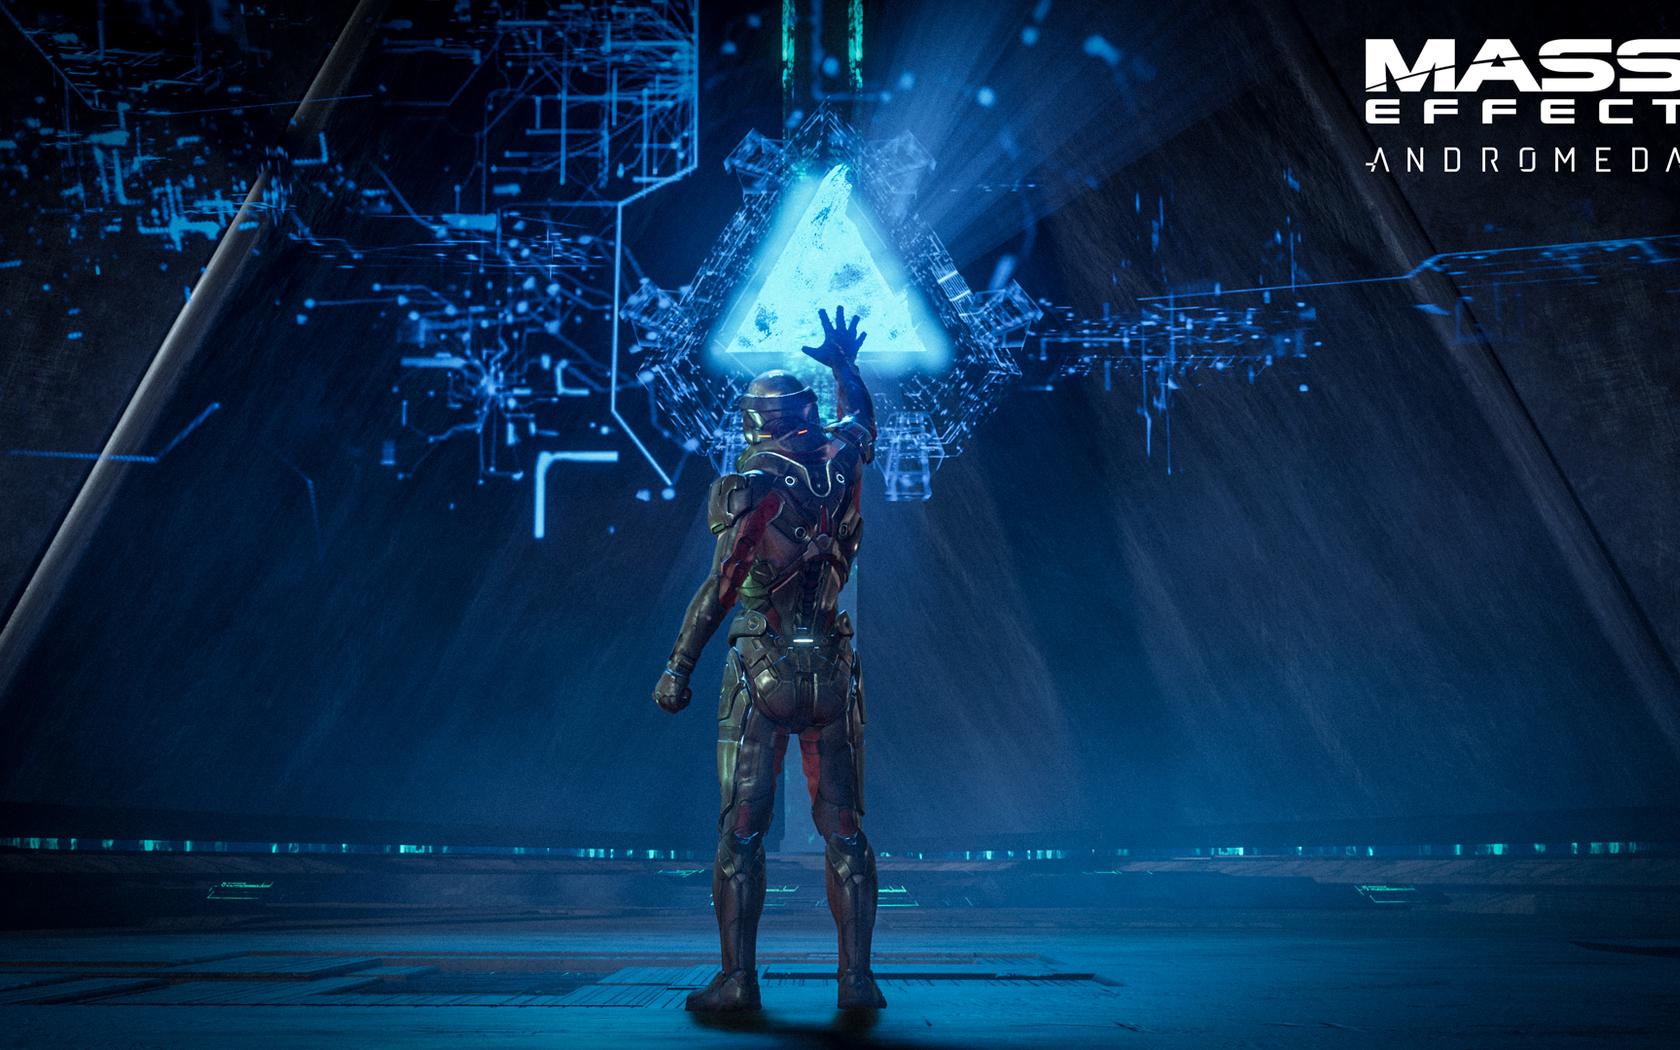 1680x1050 Mass Effect Andromeda Hd 2 1680x1050 Resolution Hd 4k